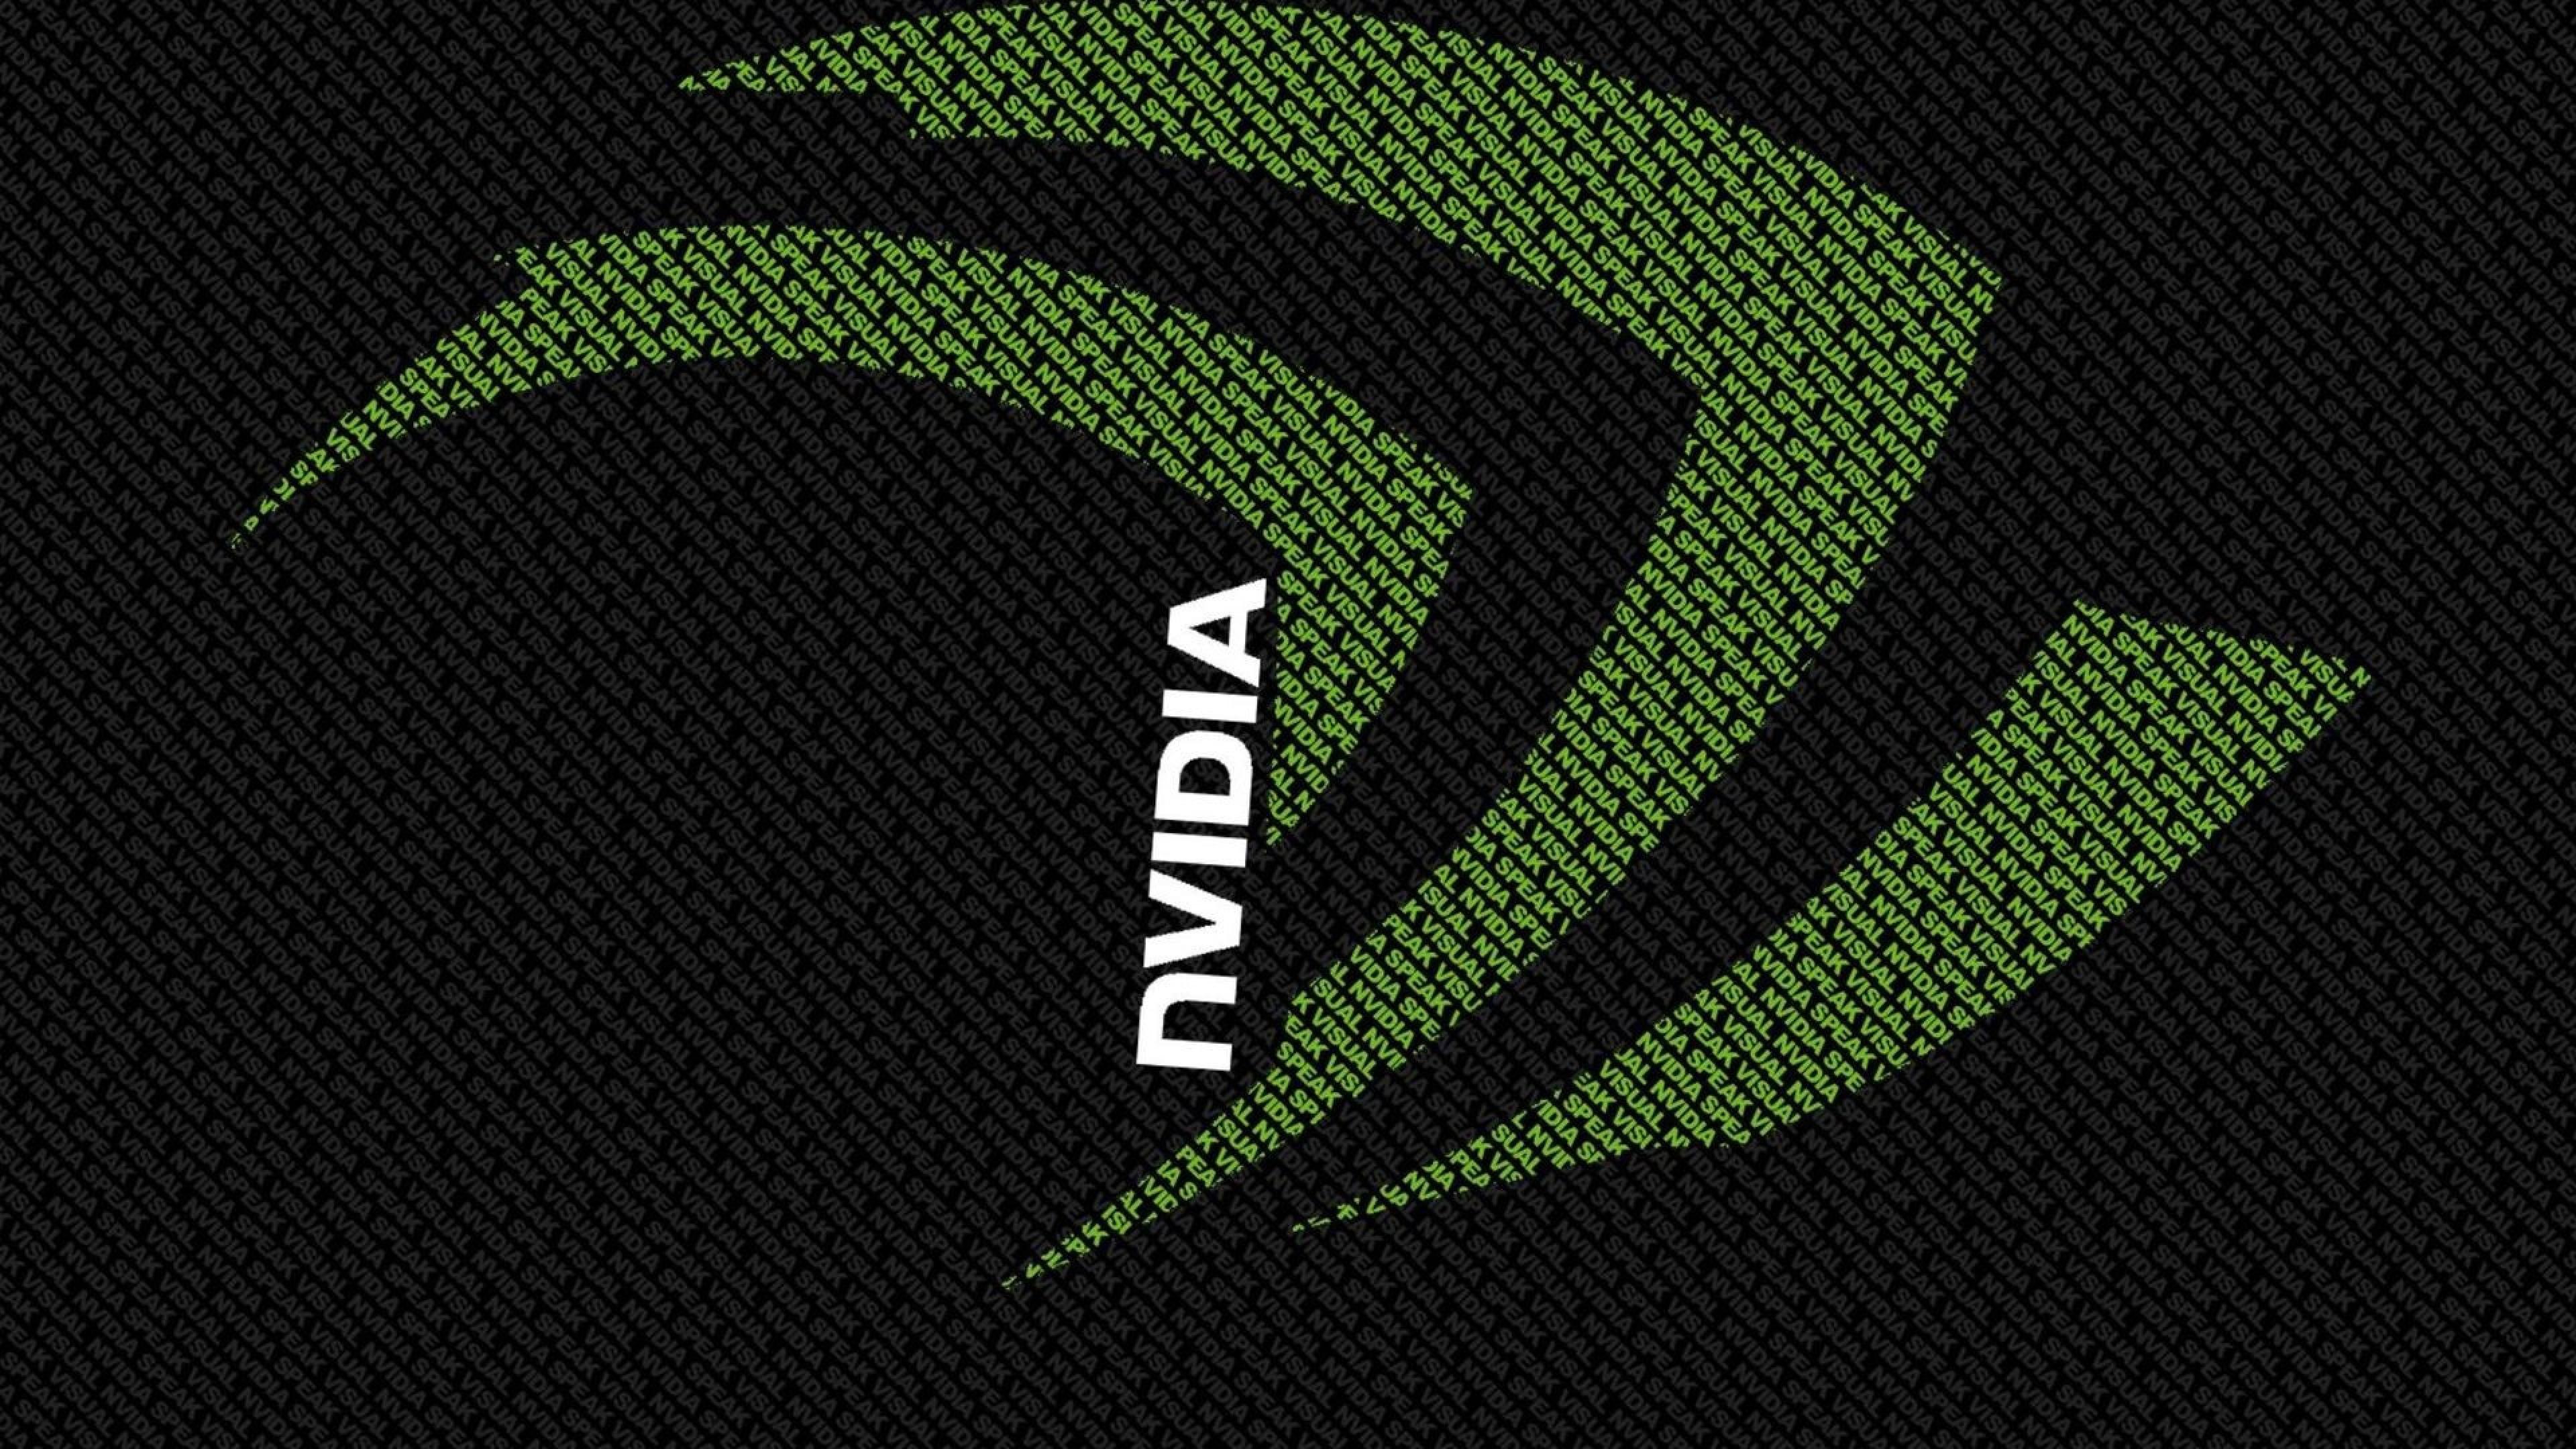 nvidia wallpaper ultra - photo #15